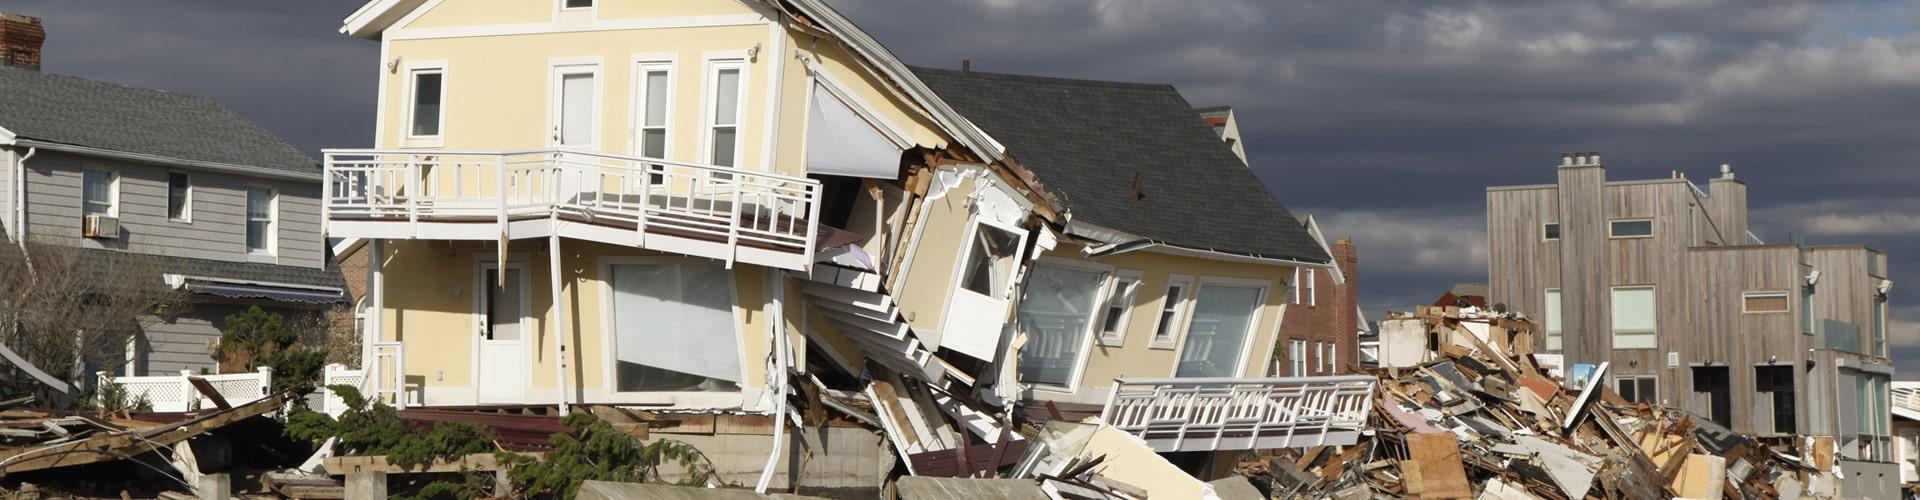 storm-damaged-home-500